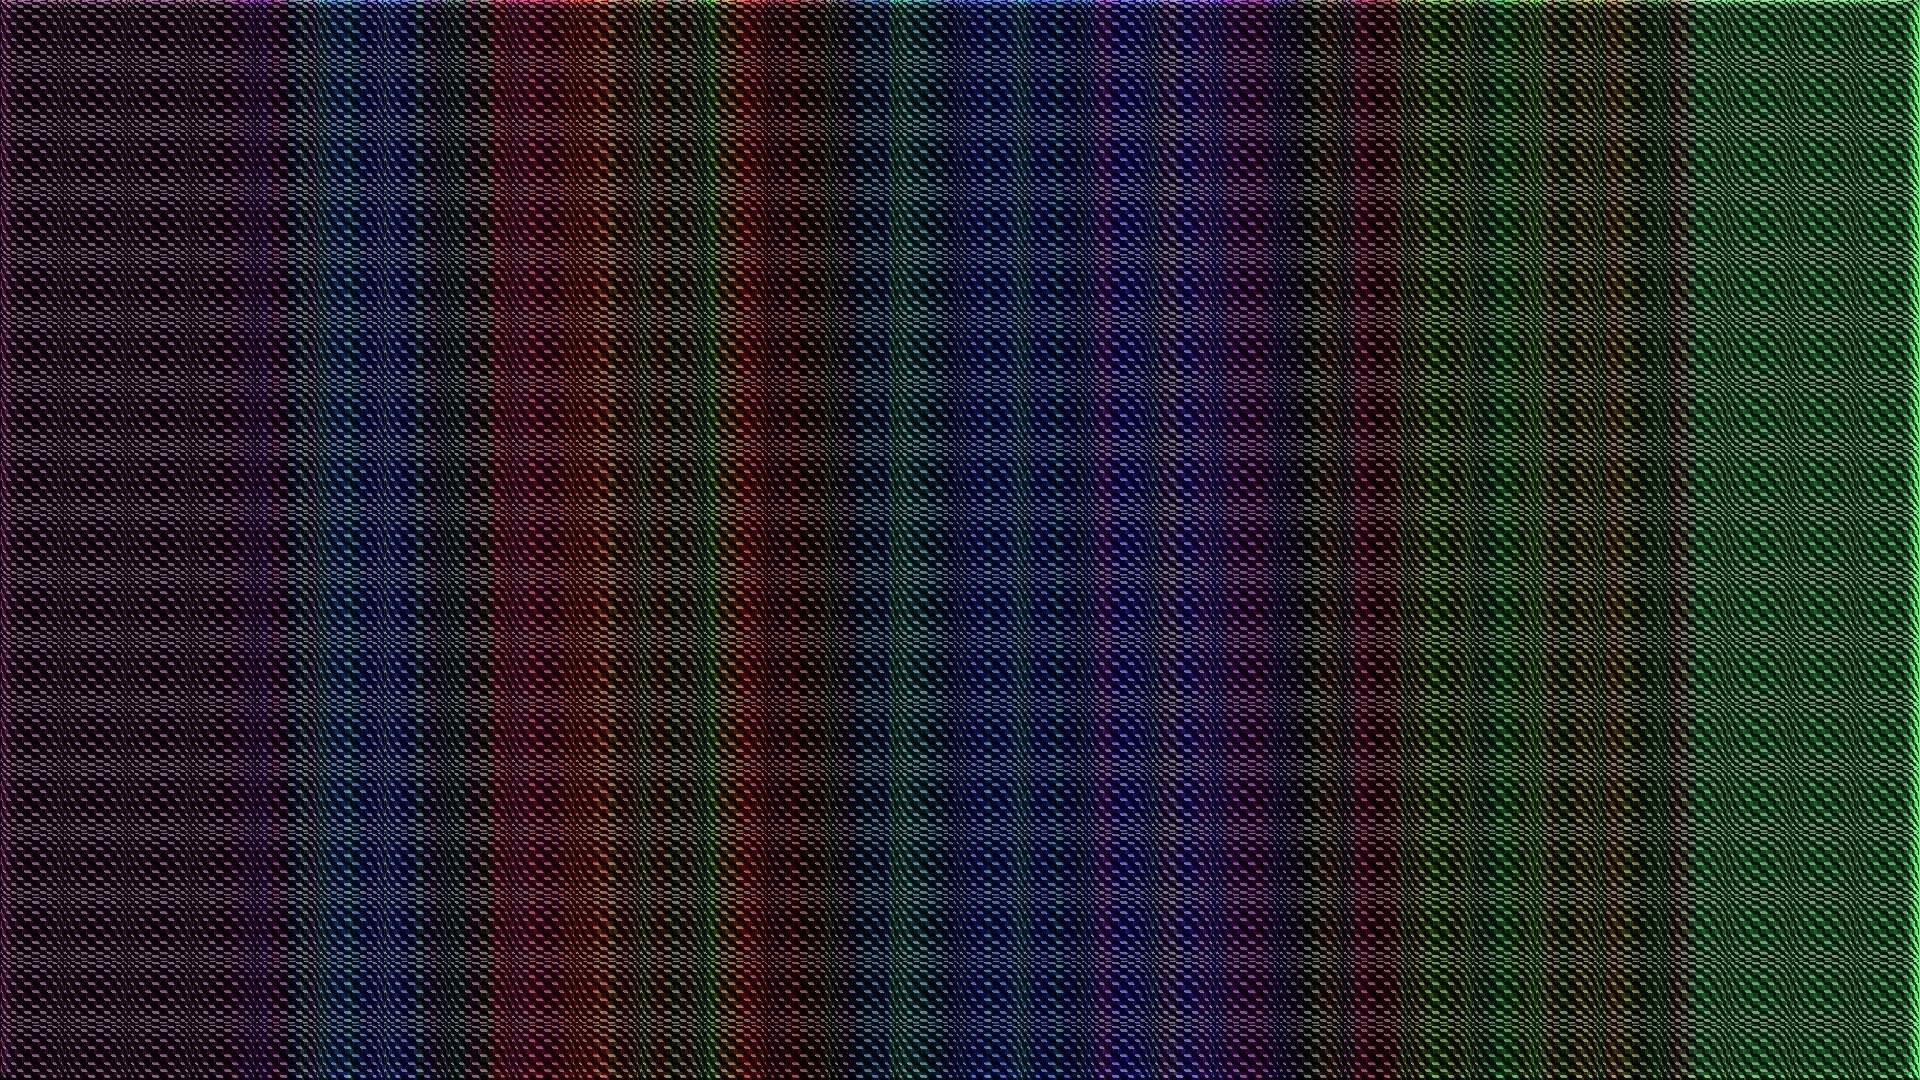 Rainbow Colored Squares